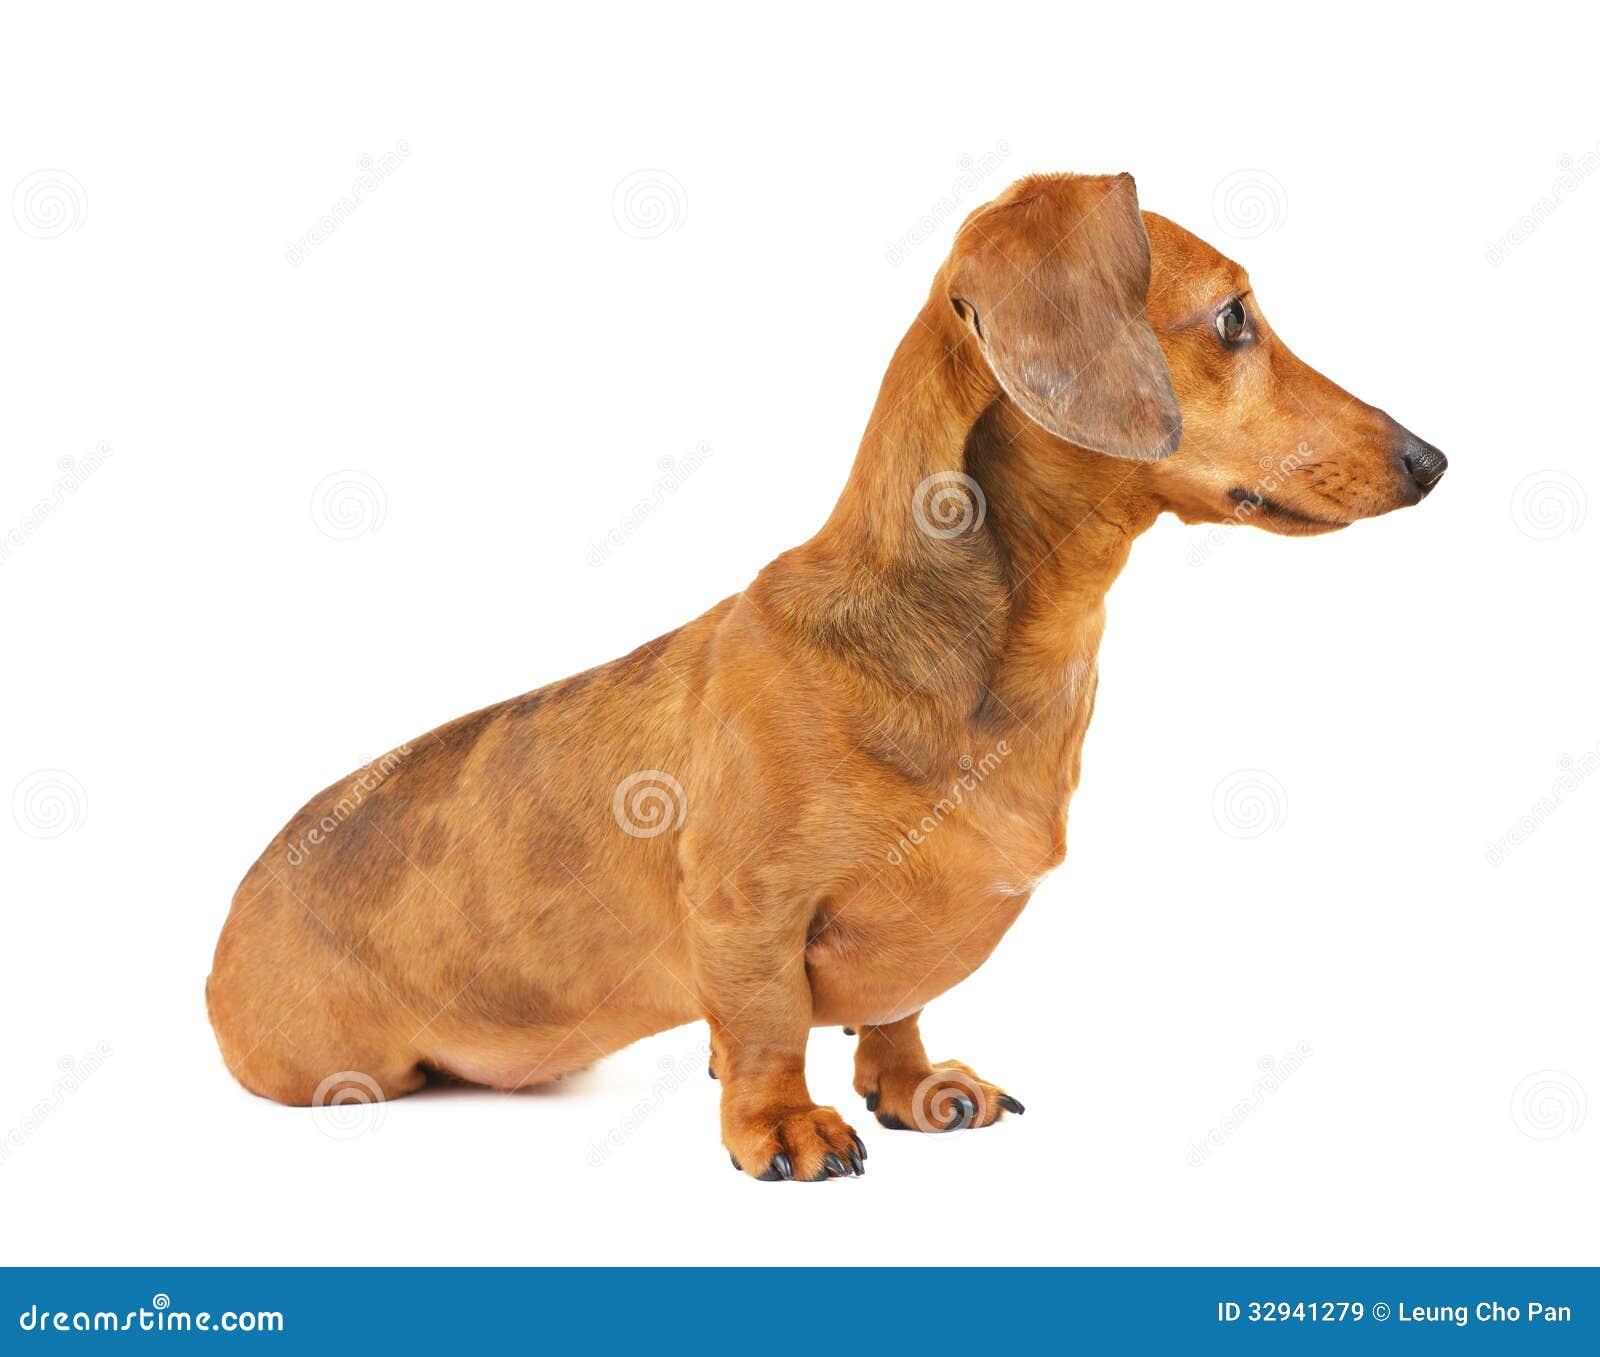 dachshund dog side view stock image image of teckel 32941279. Black Bedroom Furniture Sets. Home Design Ideas